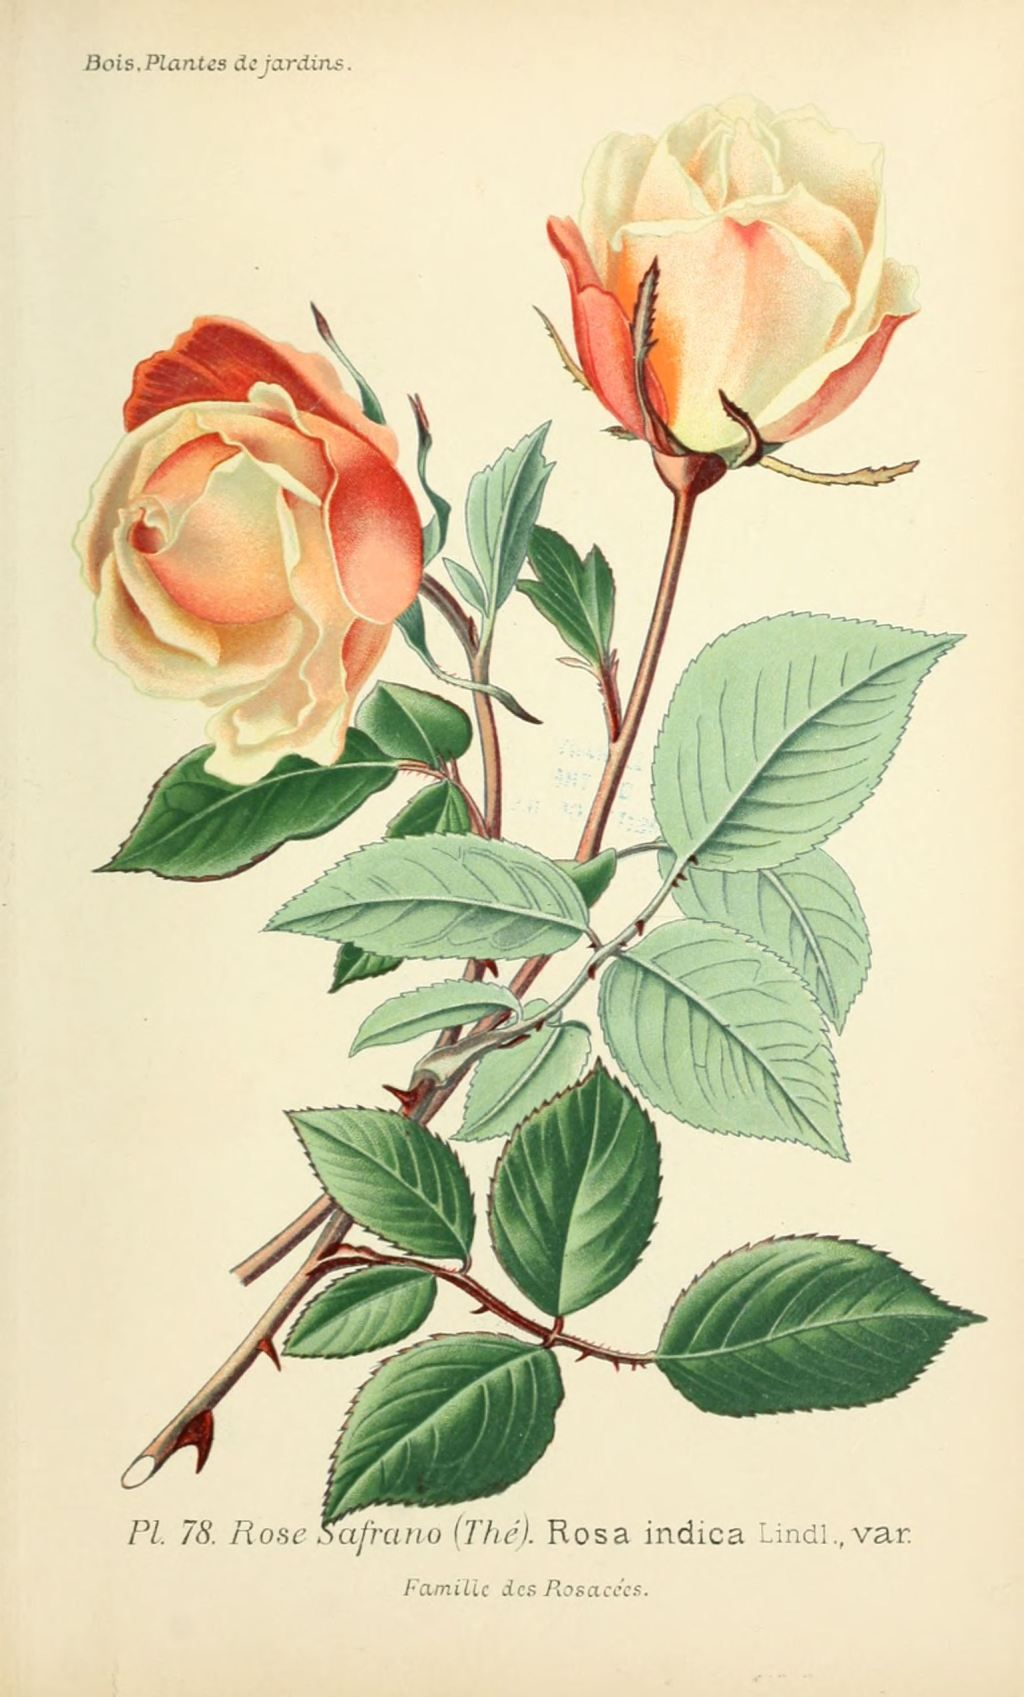 épinglé Par Amina Konukhova Sur Botanical Prints En 2019